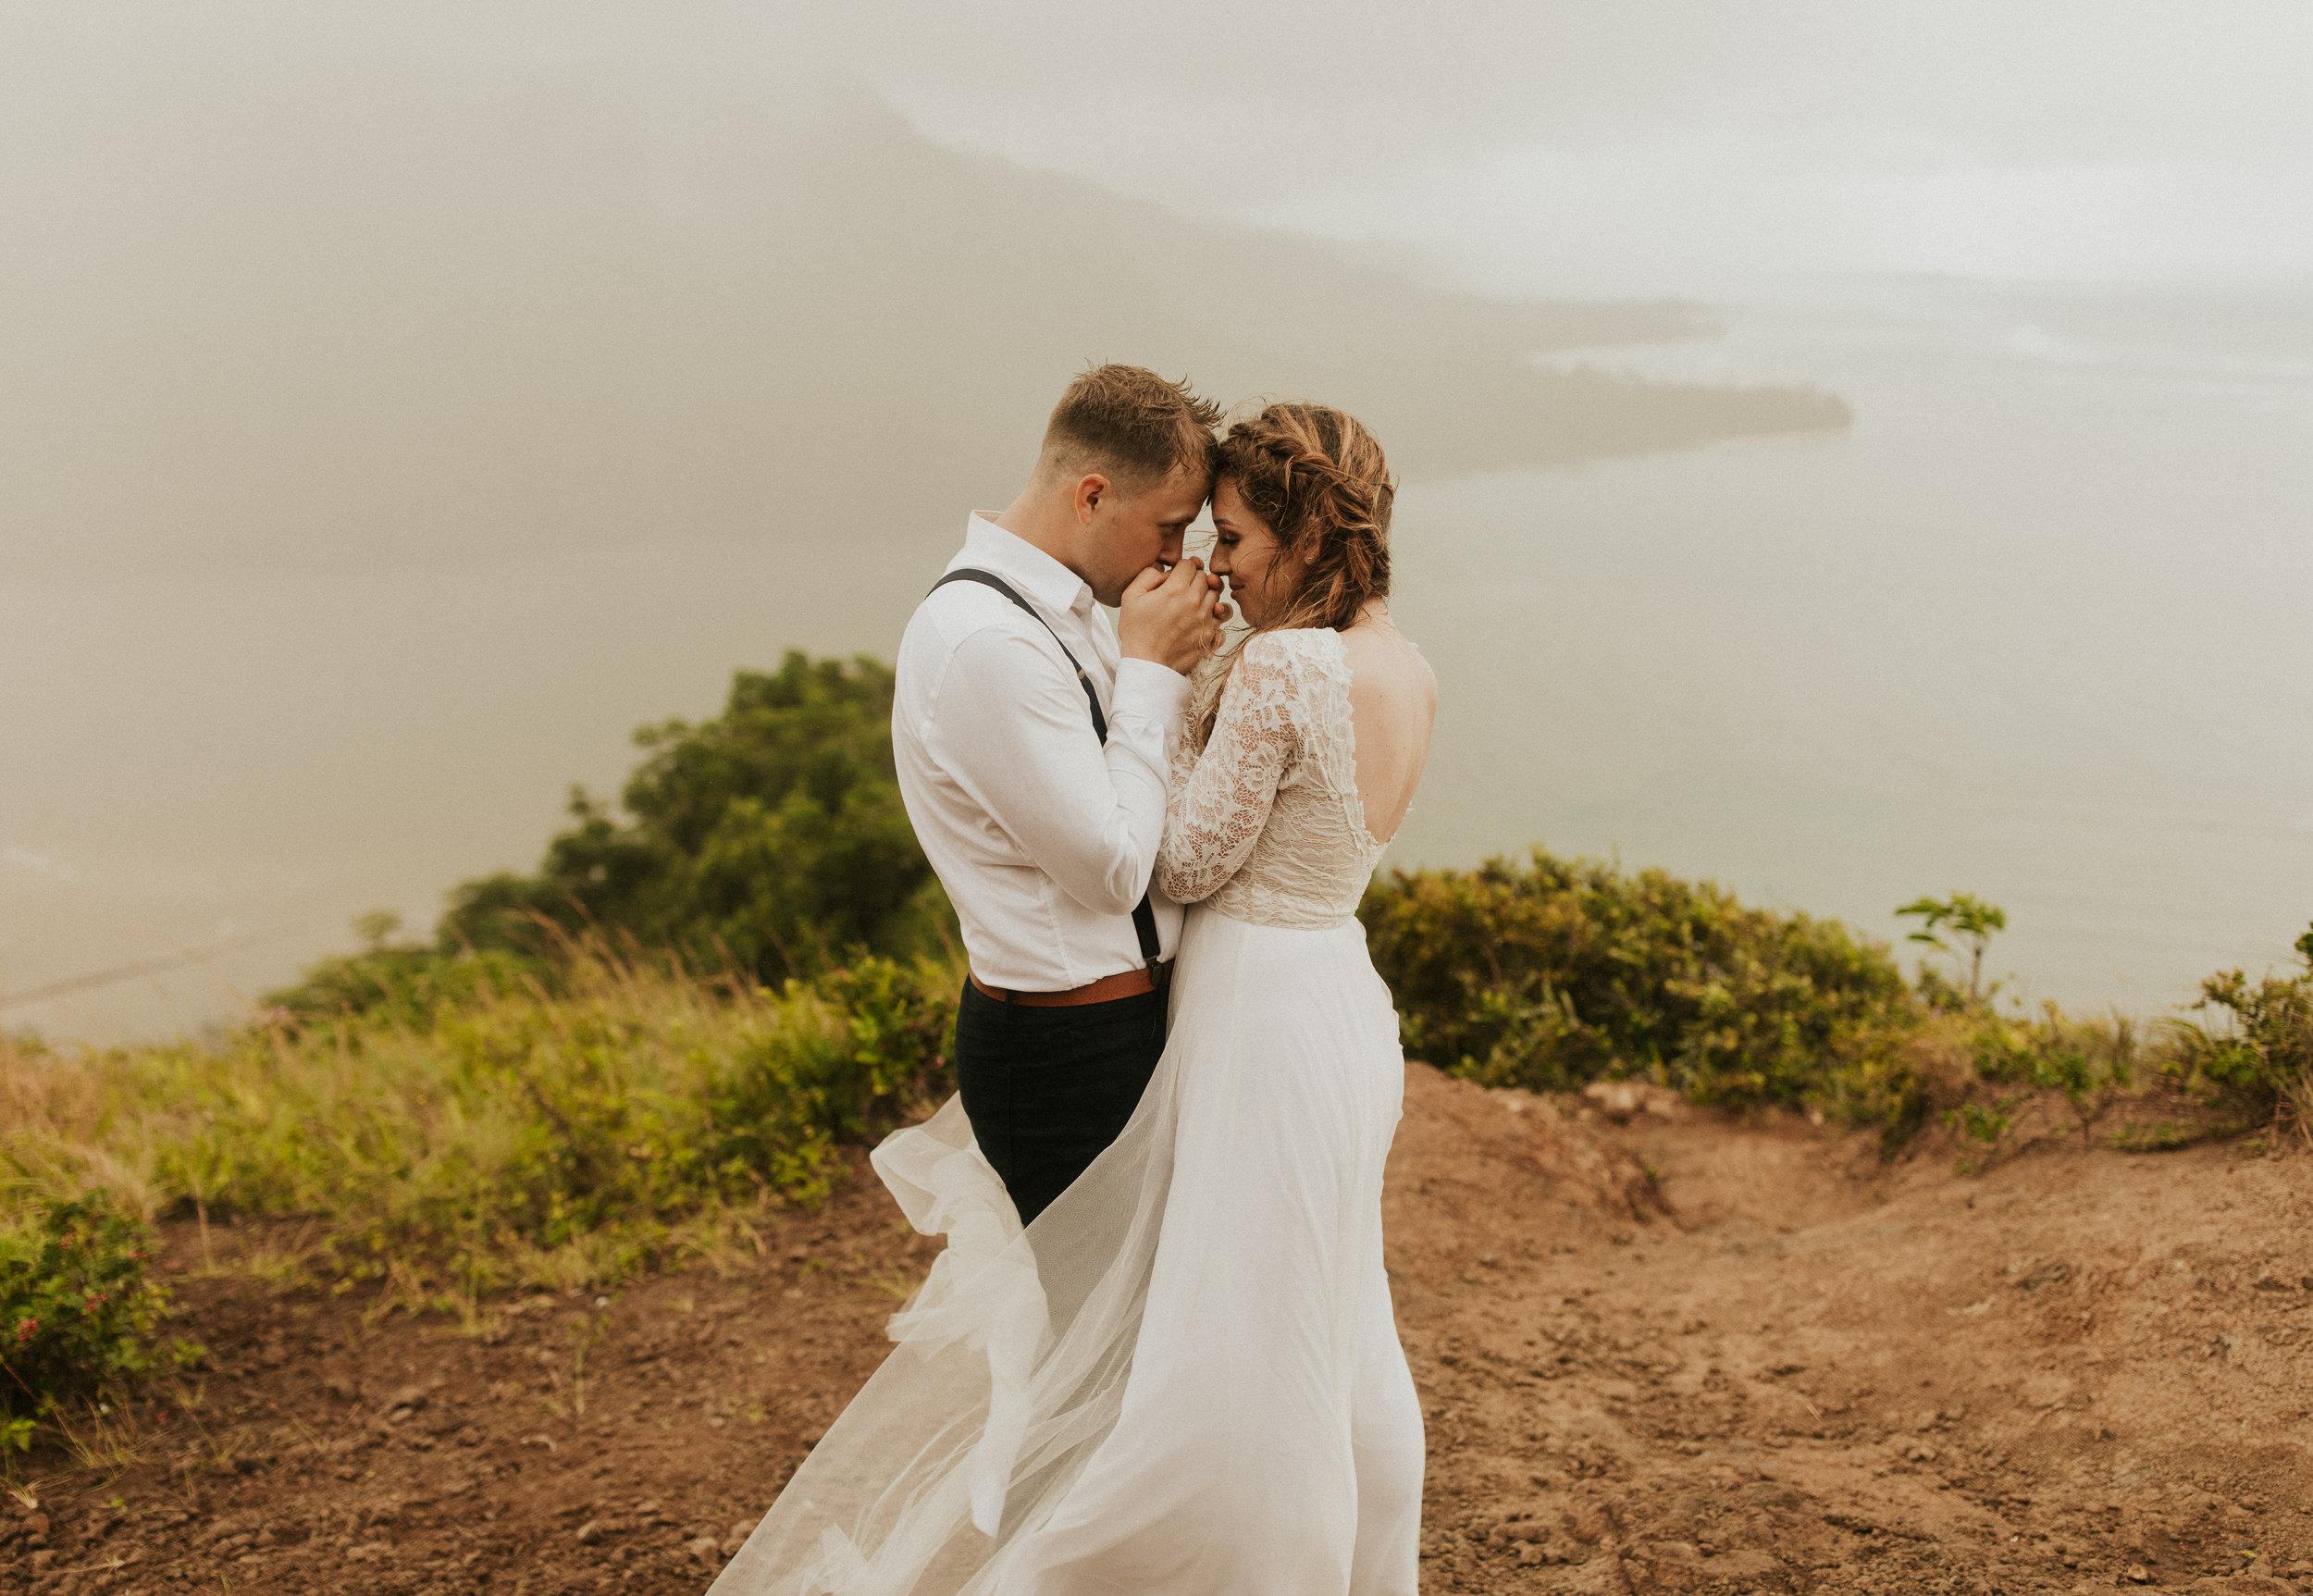 the-mclachlans-destination-elopement-photographers-mountain-hike-sena-eric-125.jpg